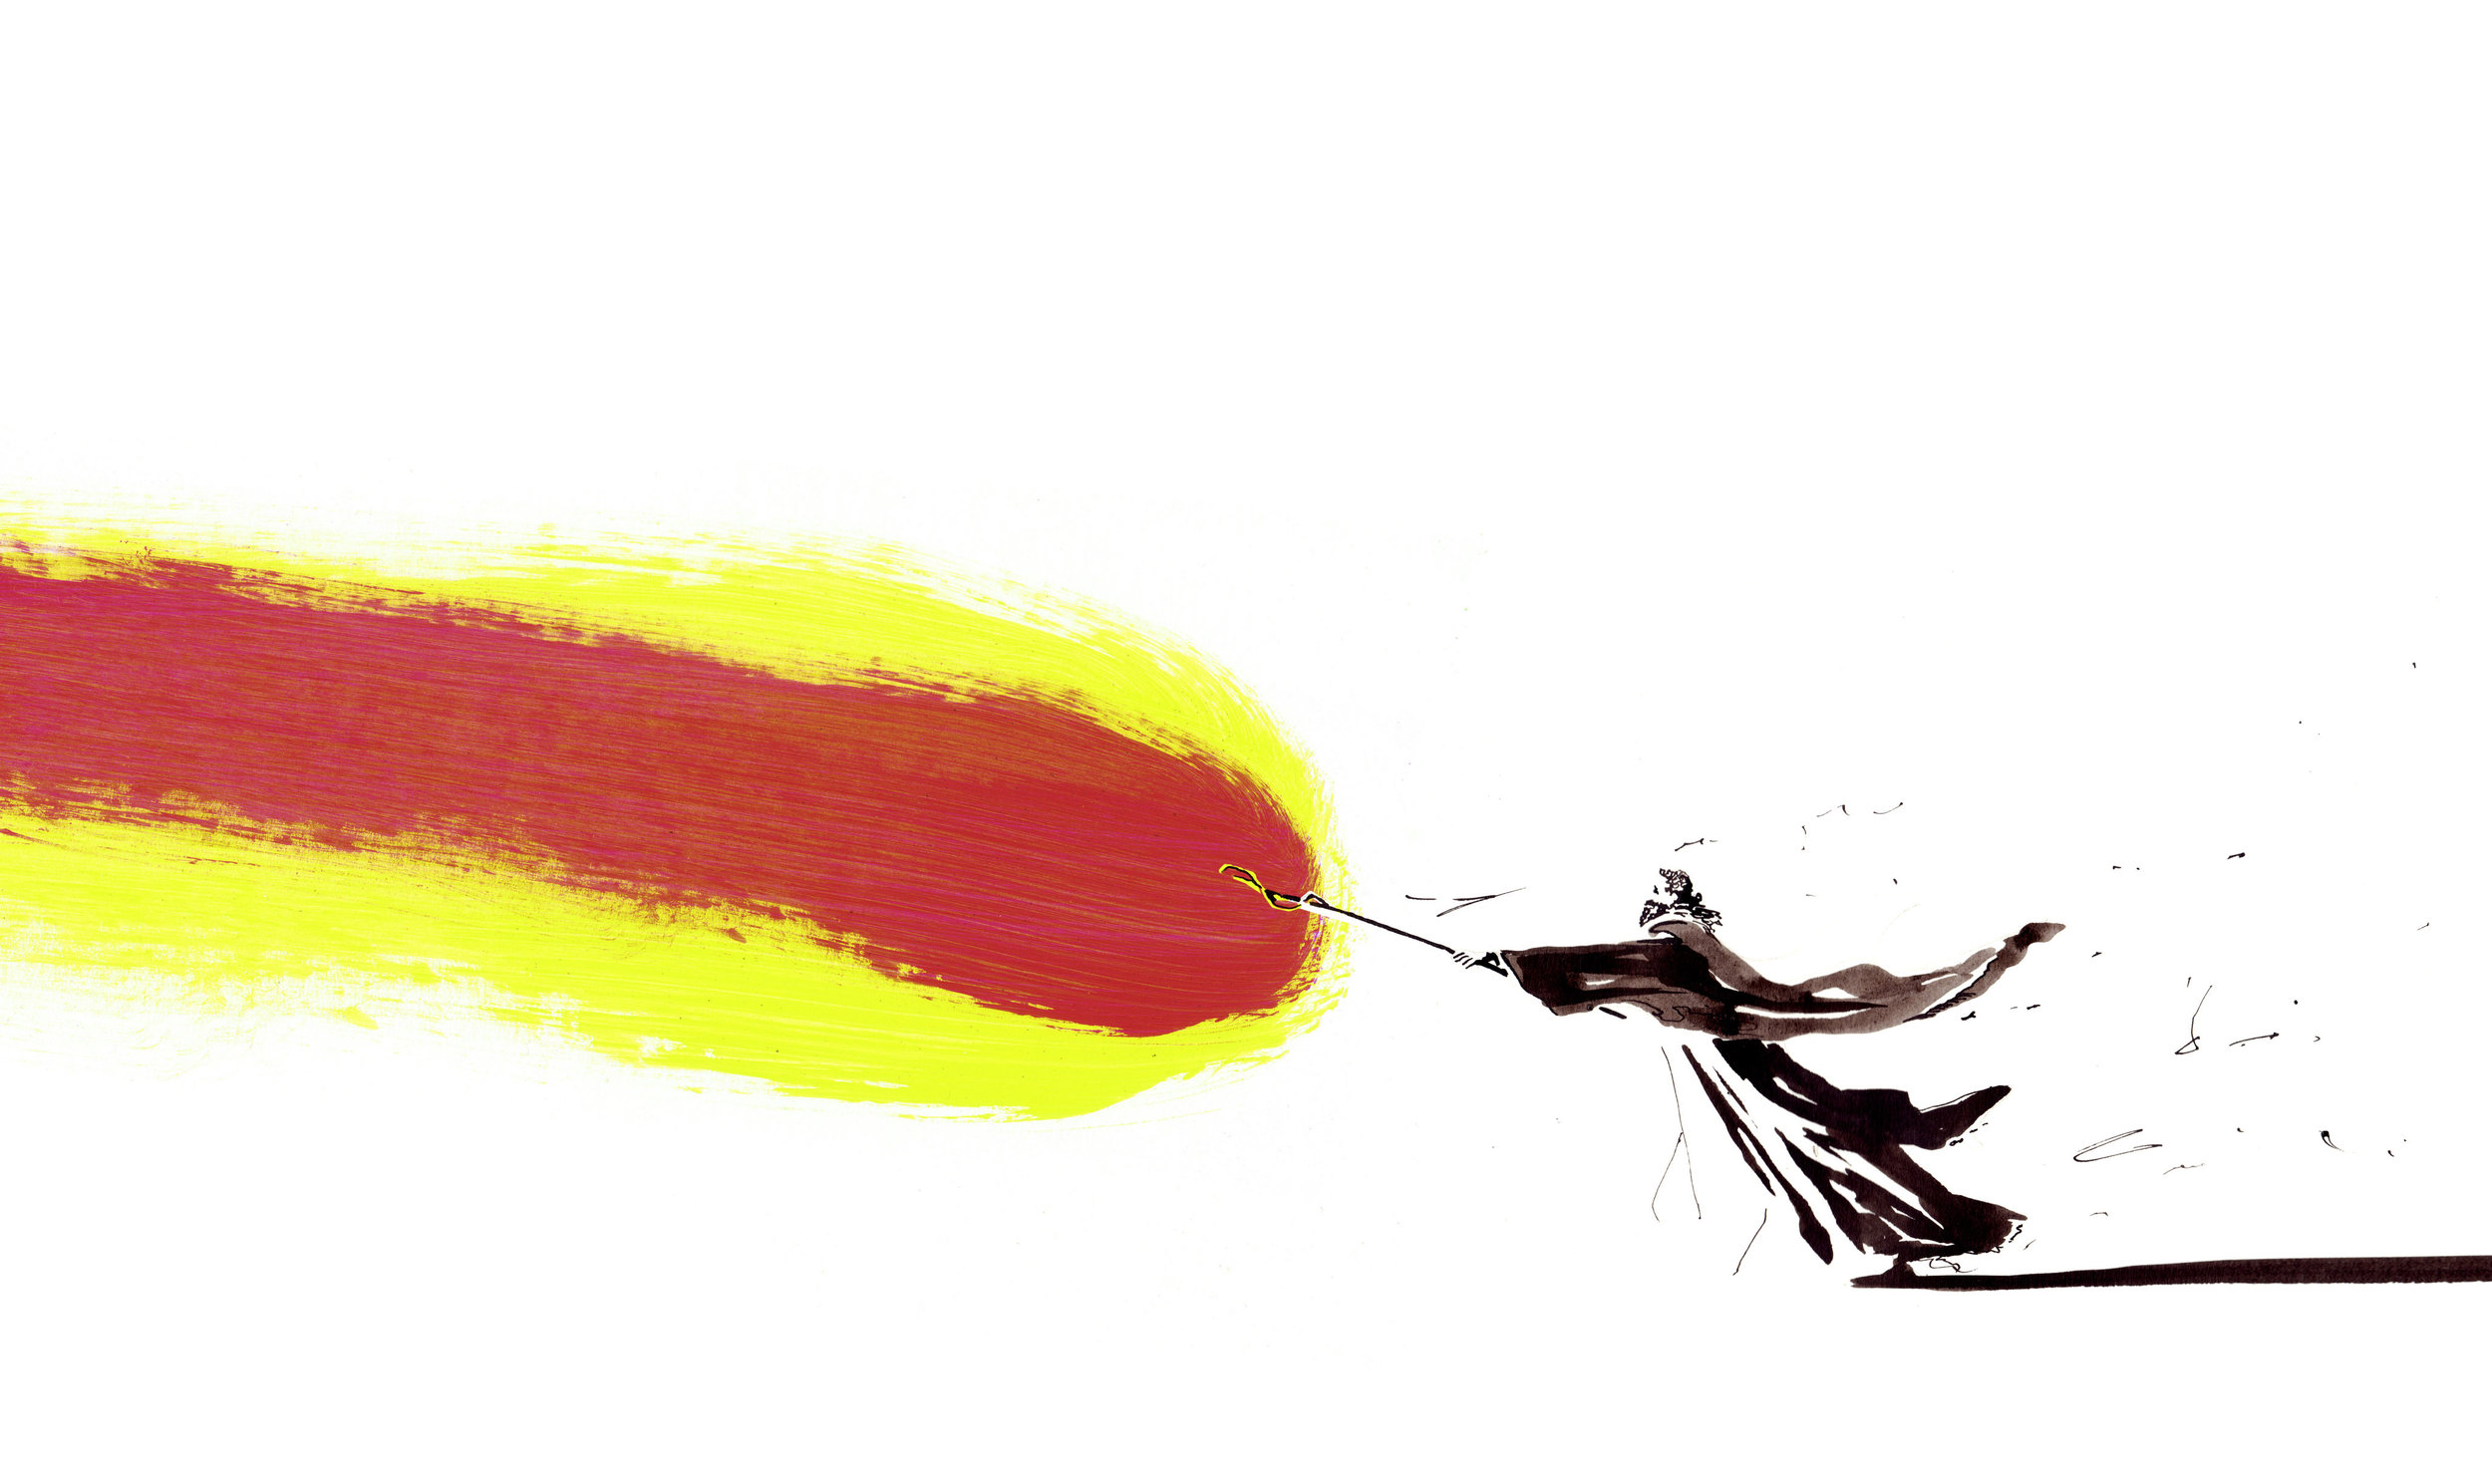 Illustration by  Jonat Deelstra